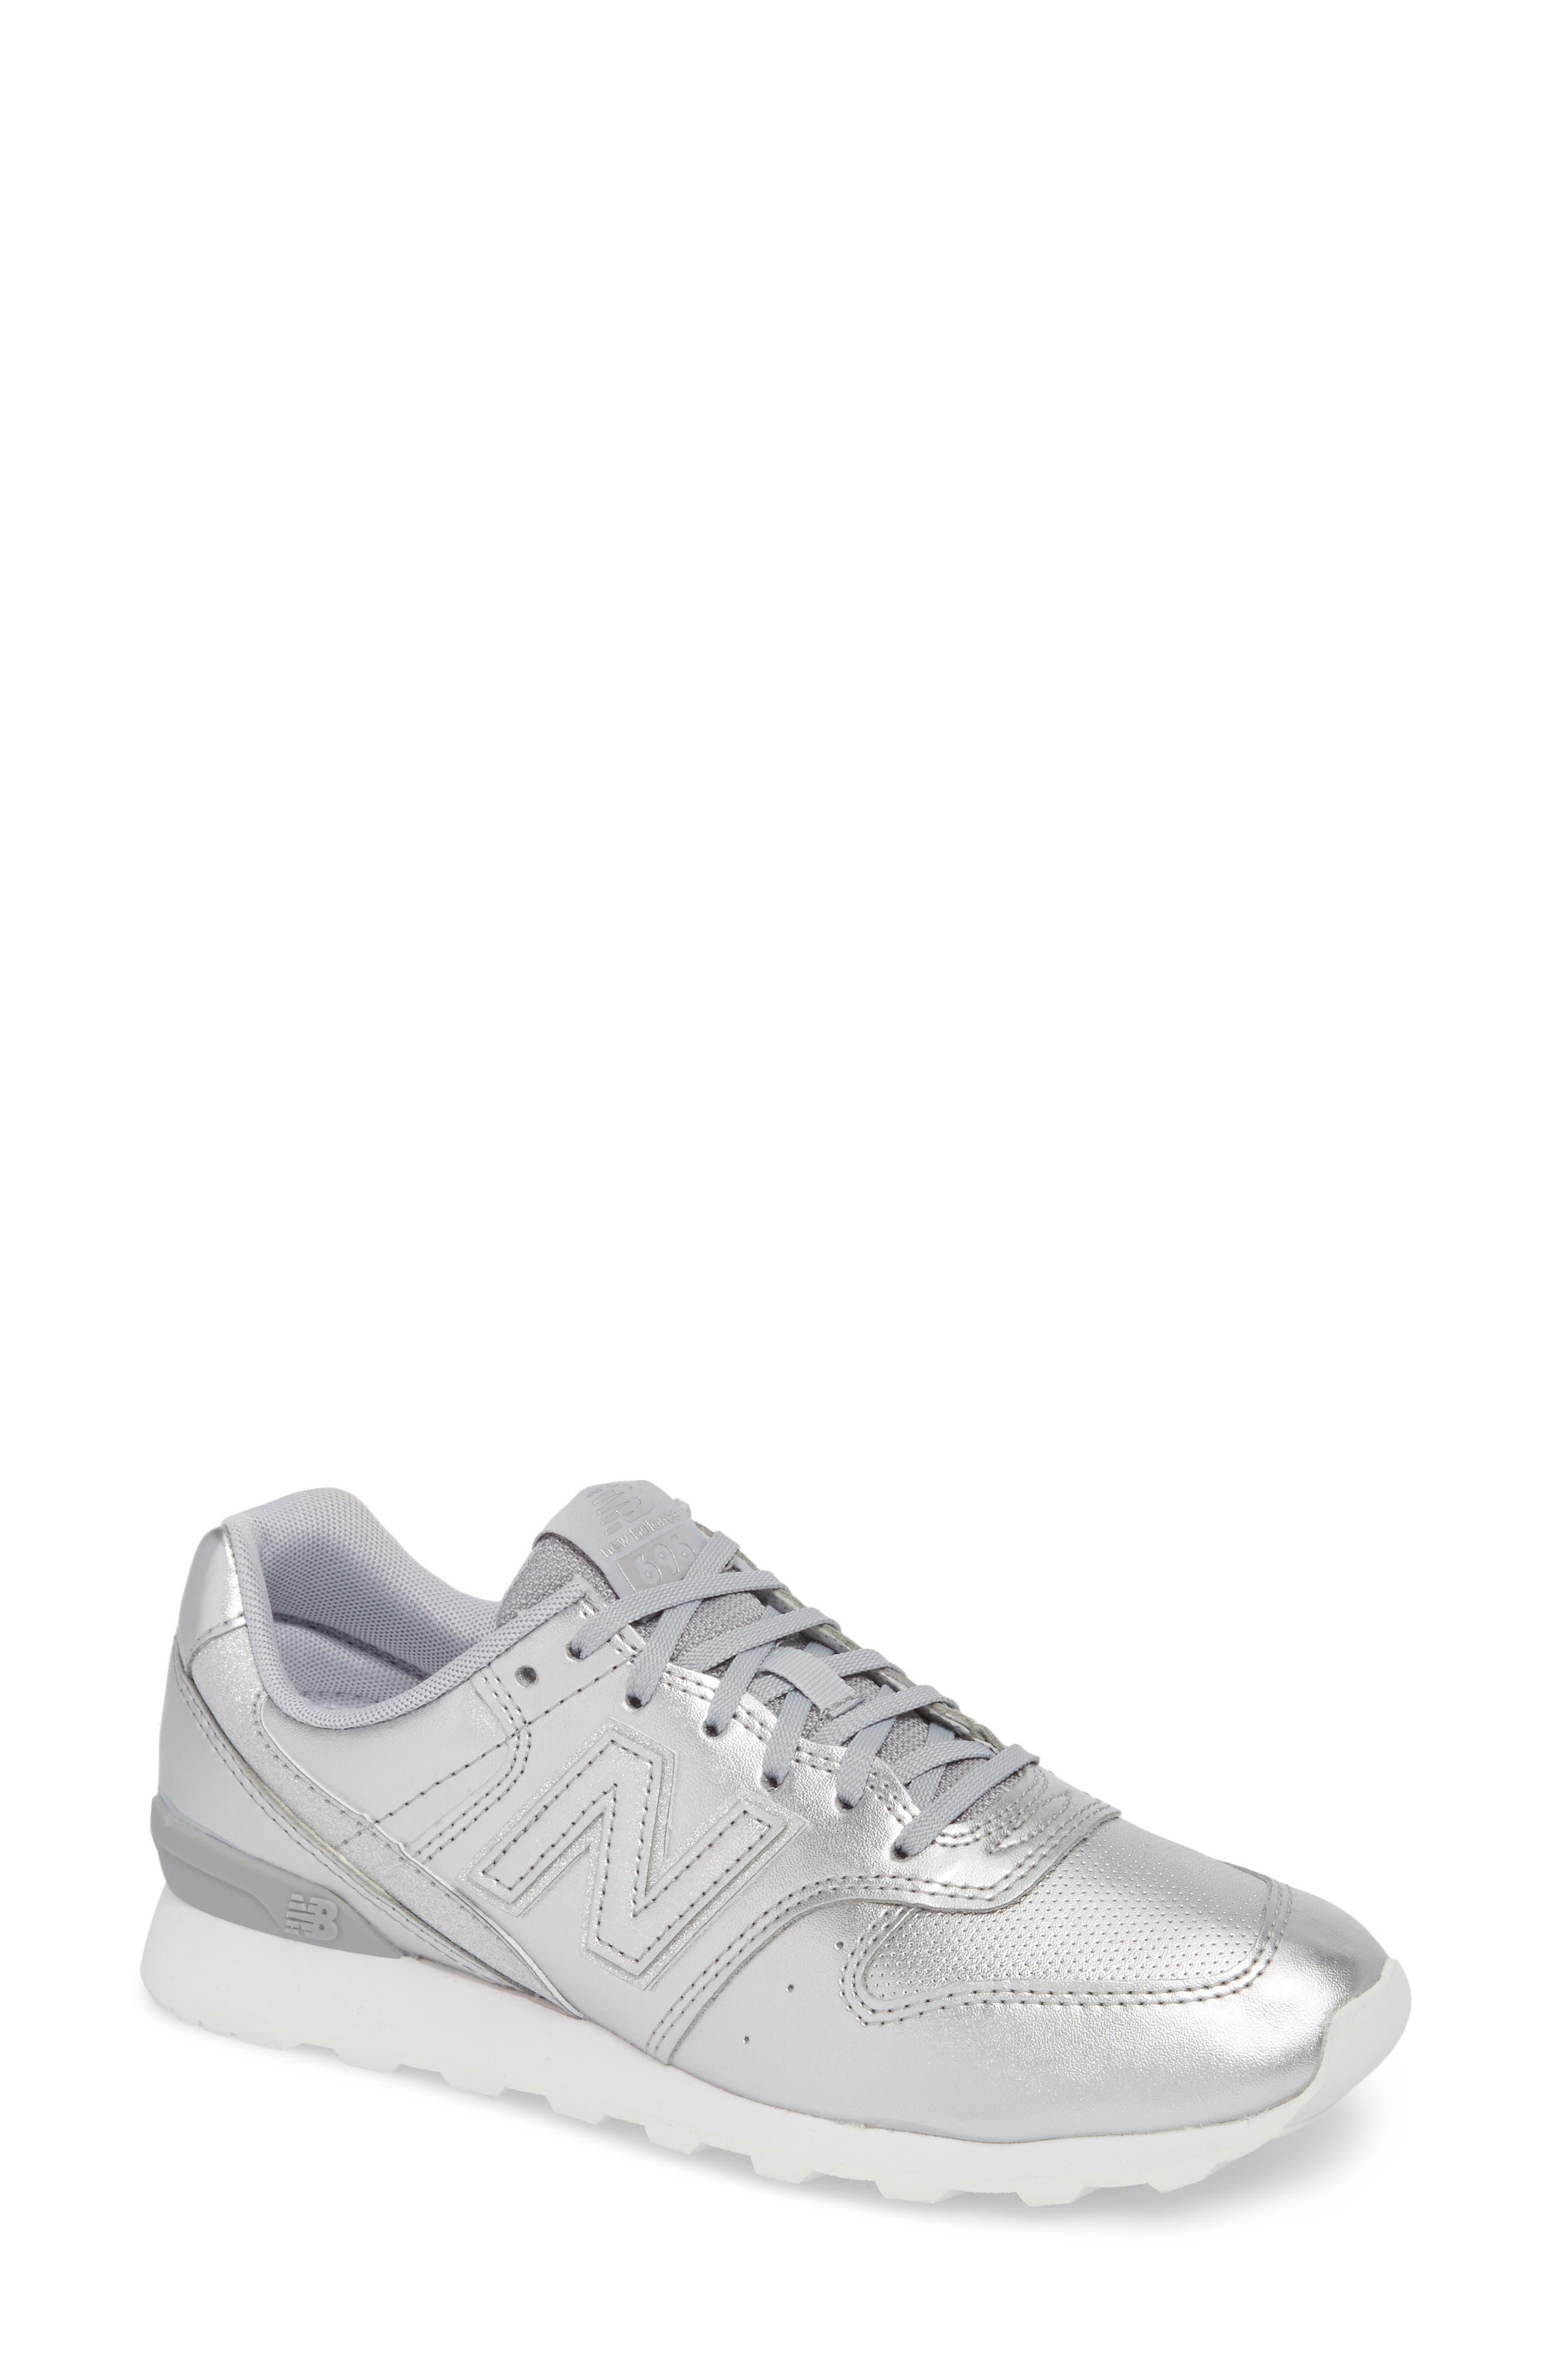 696 Sneaker,                         Main,                         color, Metallic Silver